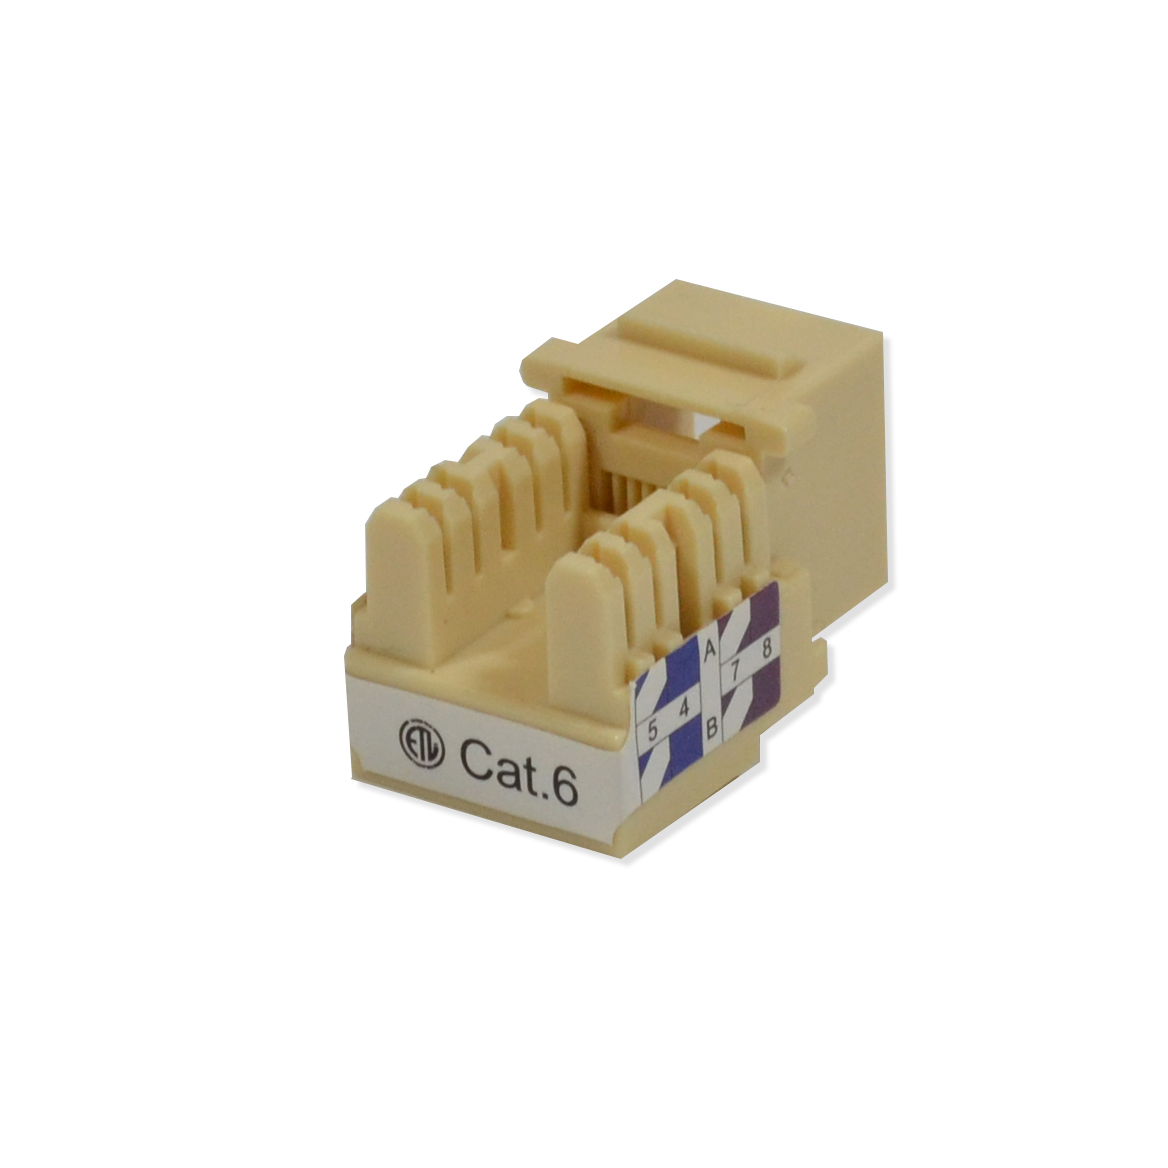 25 Pack Lot Keystone Jack Cat6 Ivory Network Ethernet 110